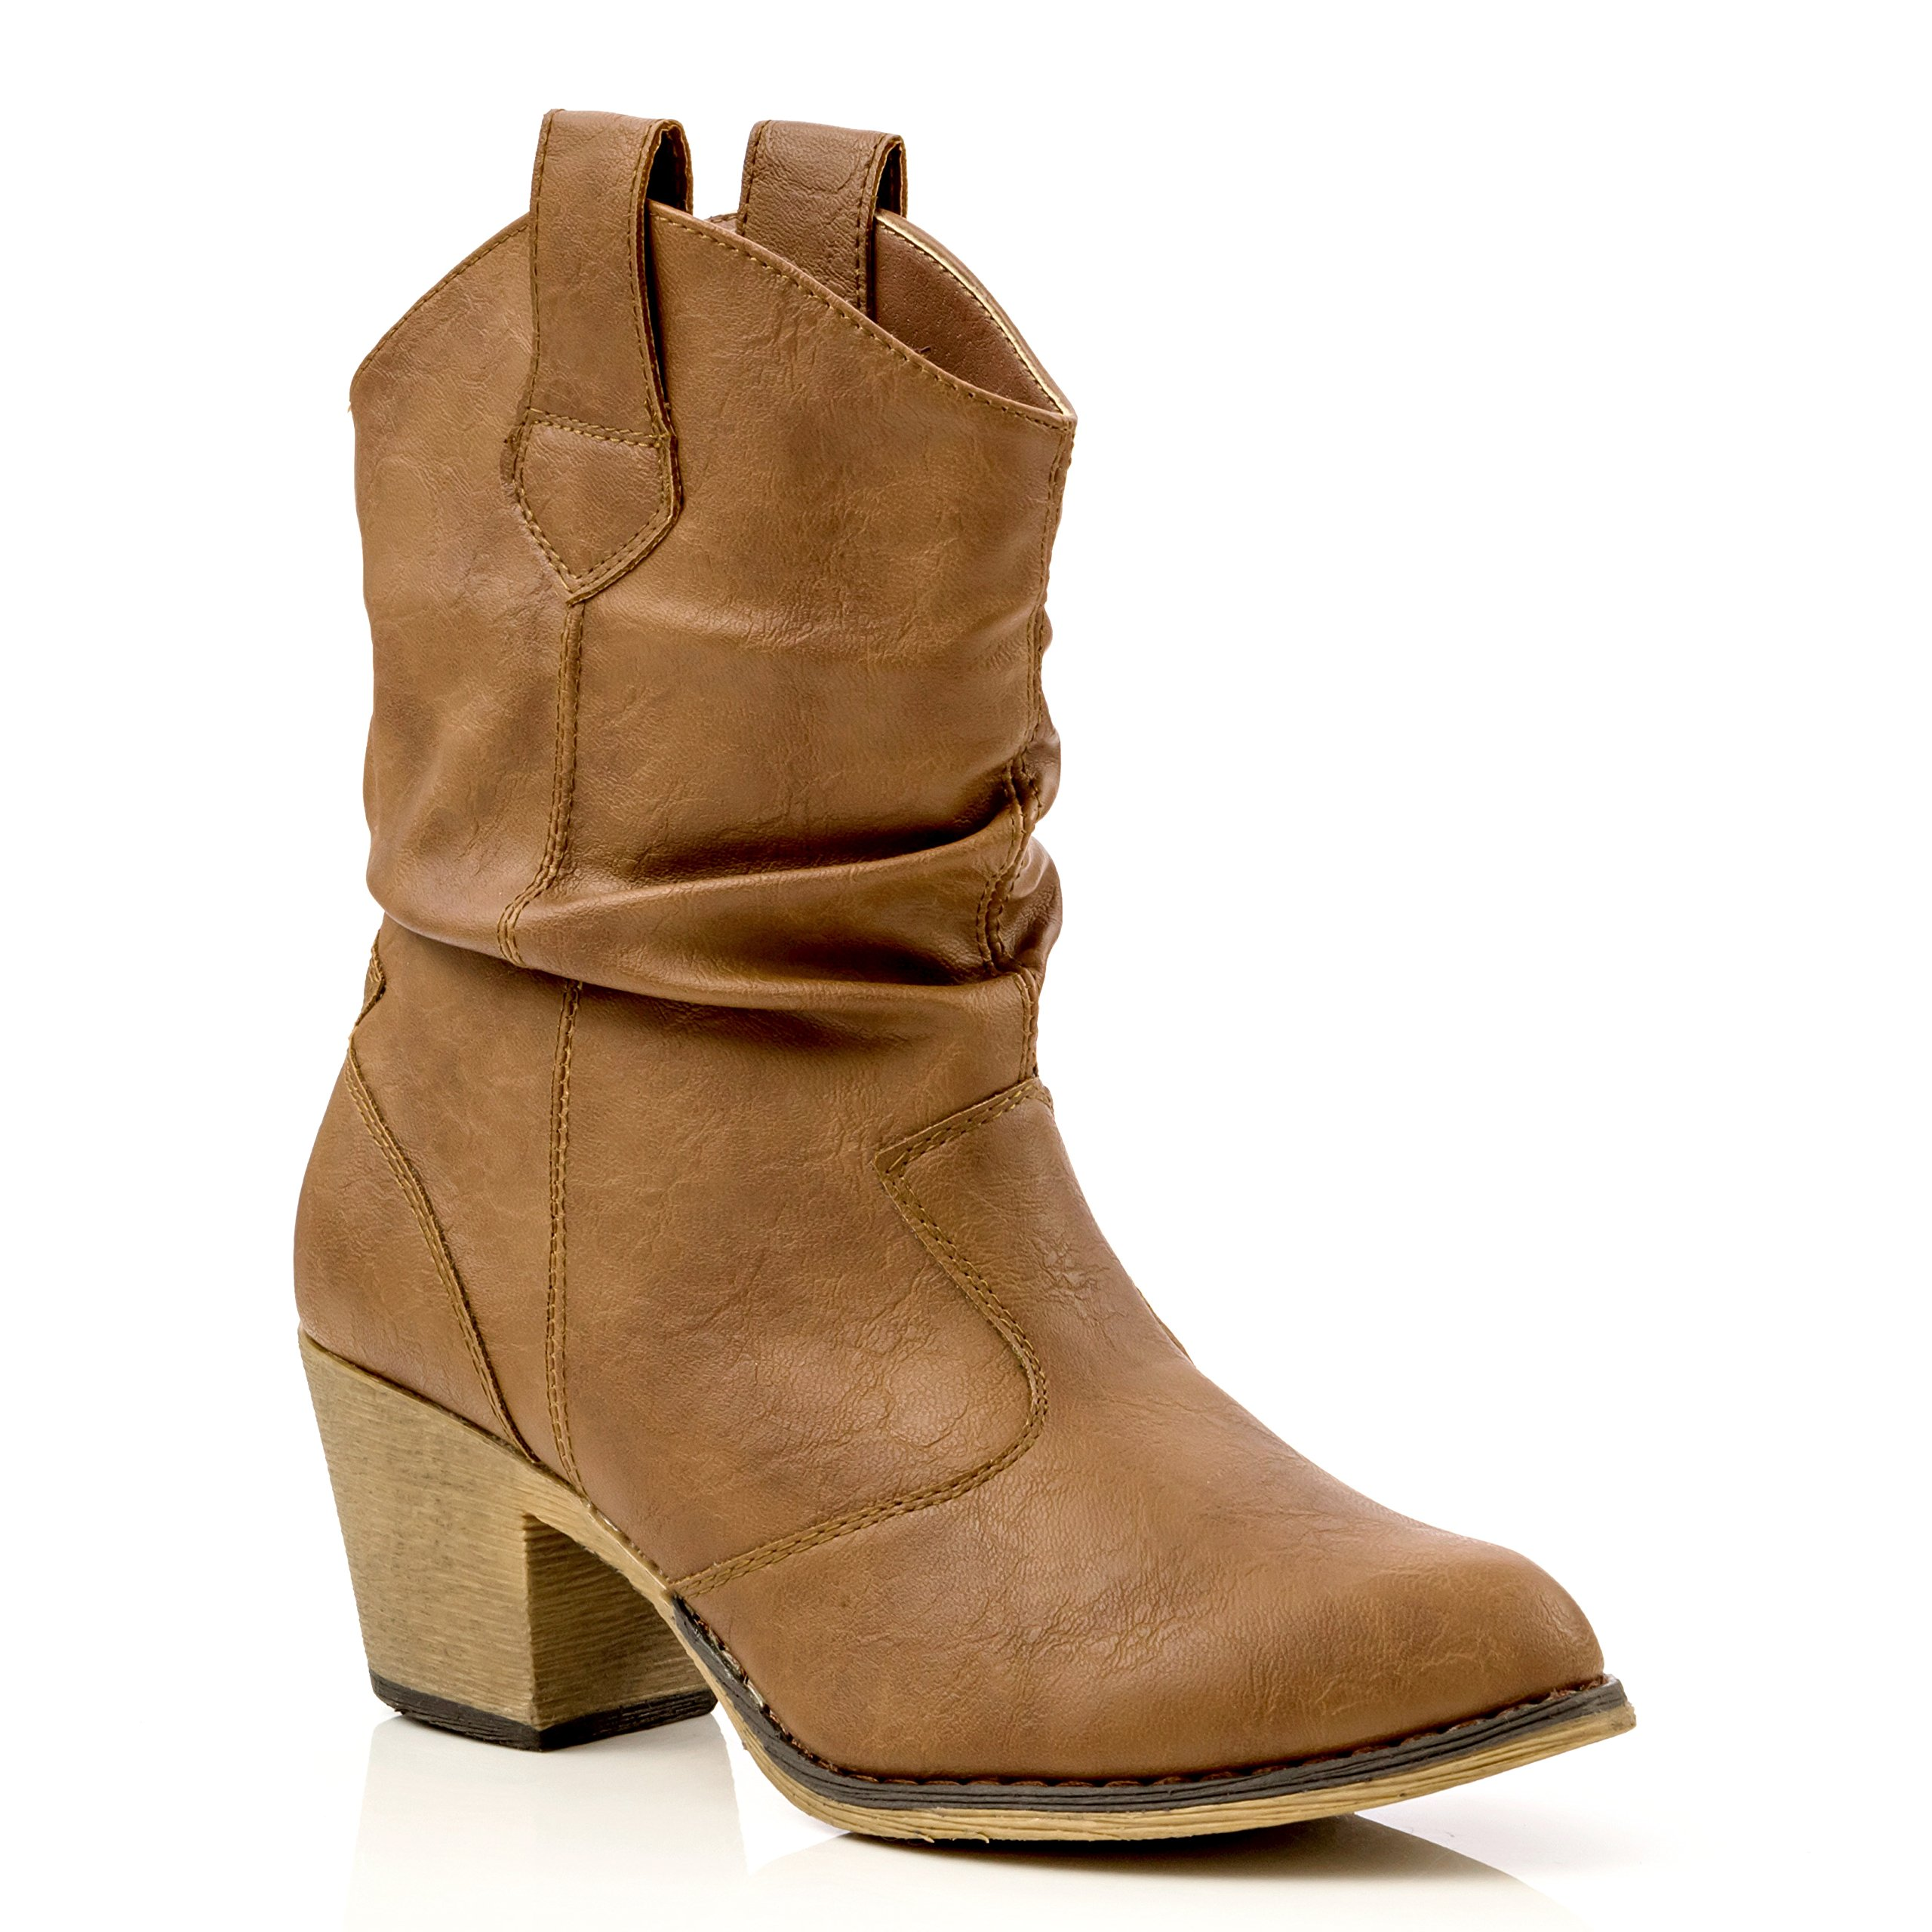 Charles Albert Women's Modern Western Cowboy Distressed Boot Pull-up Tabs (8, Cognac)